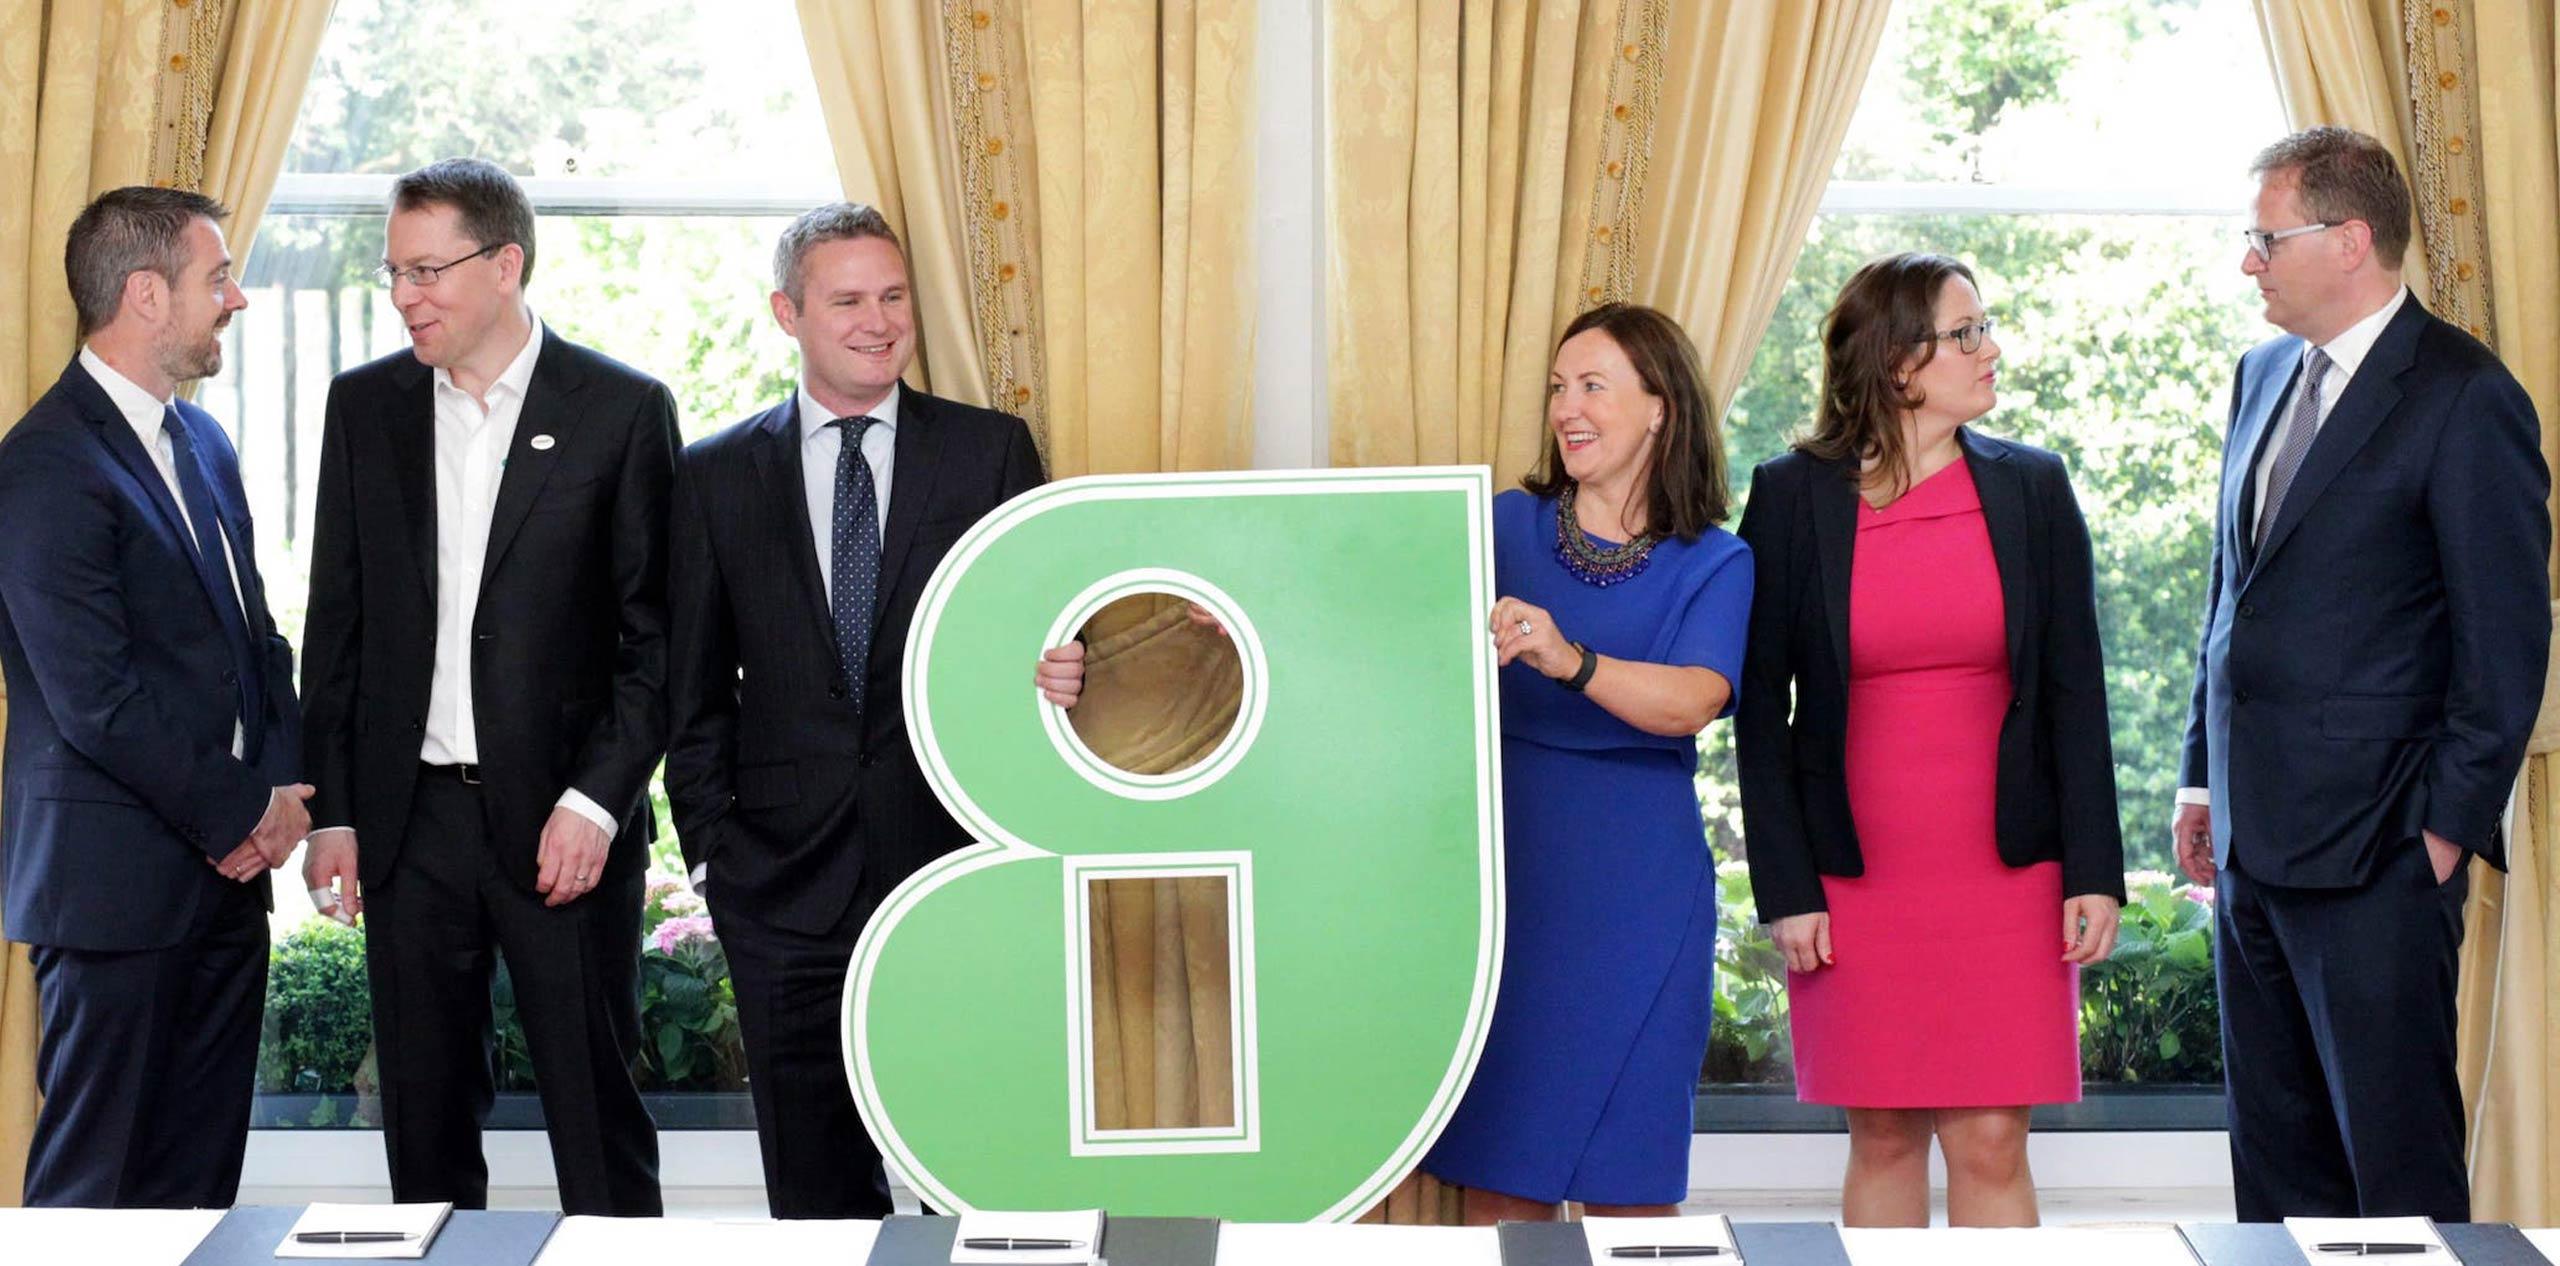 Guaranteed Irish - What We do